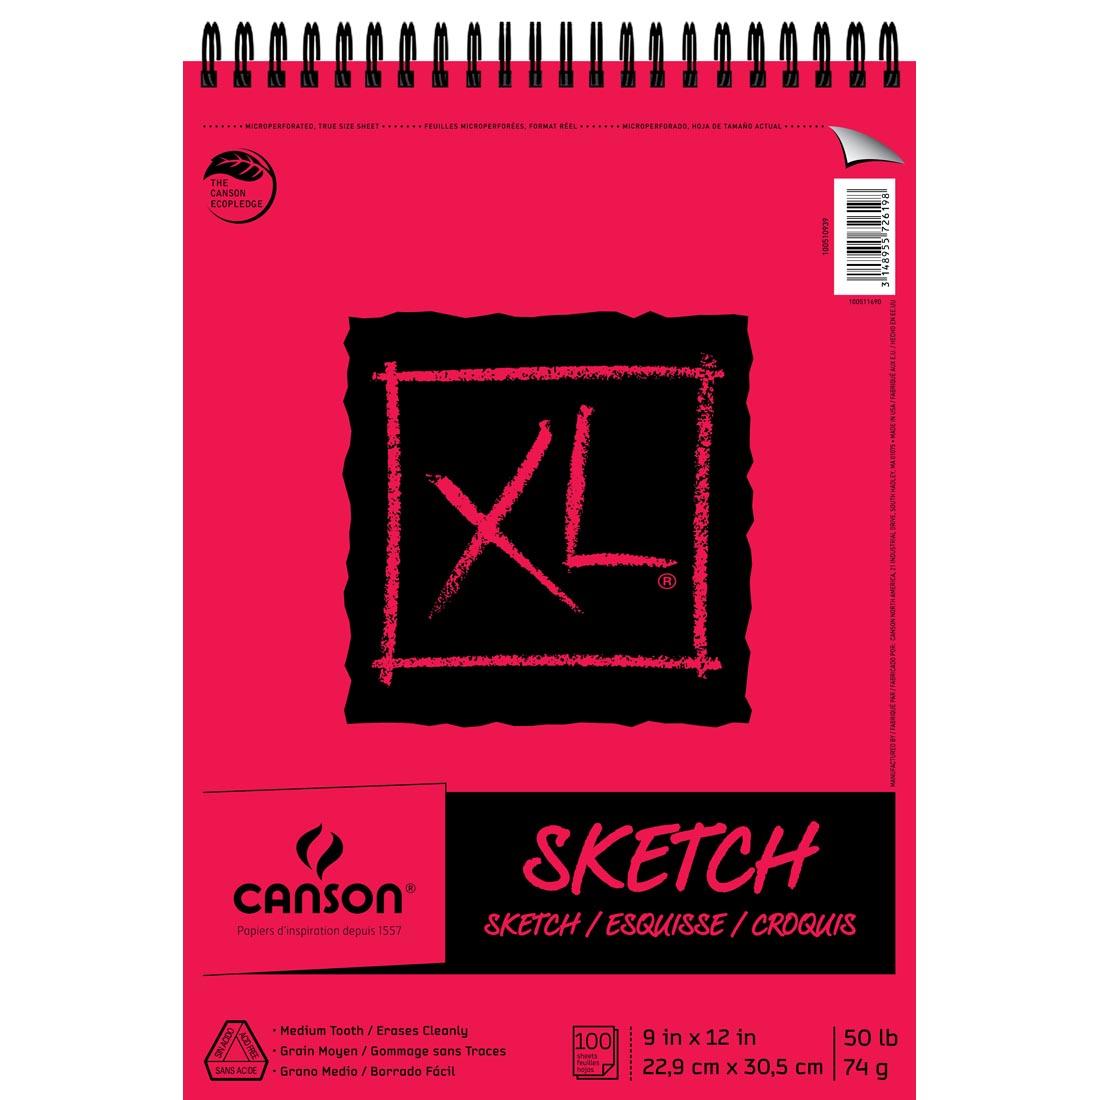 Canson XL Series Sketch Book